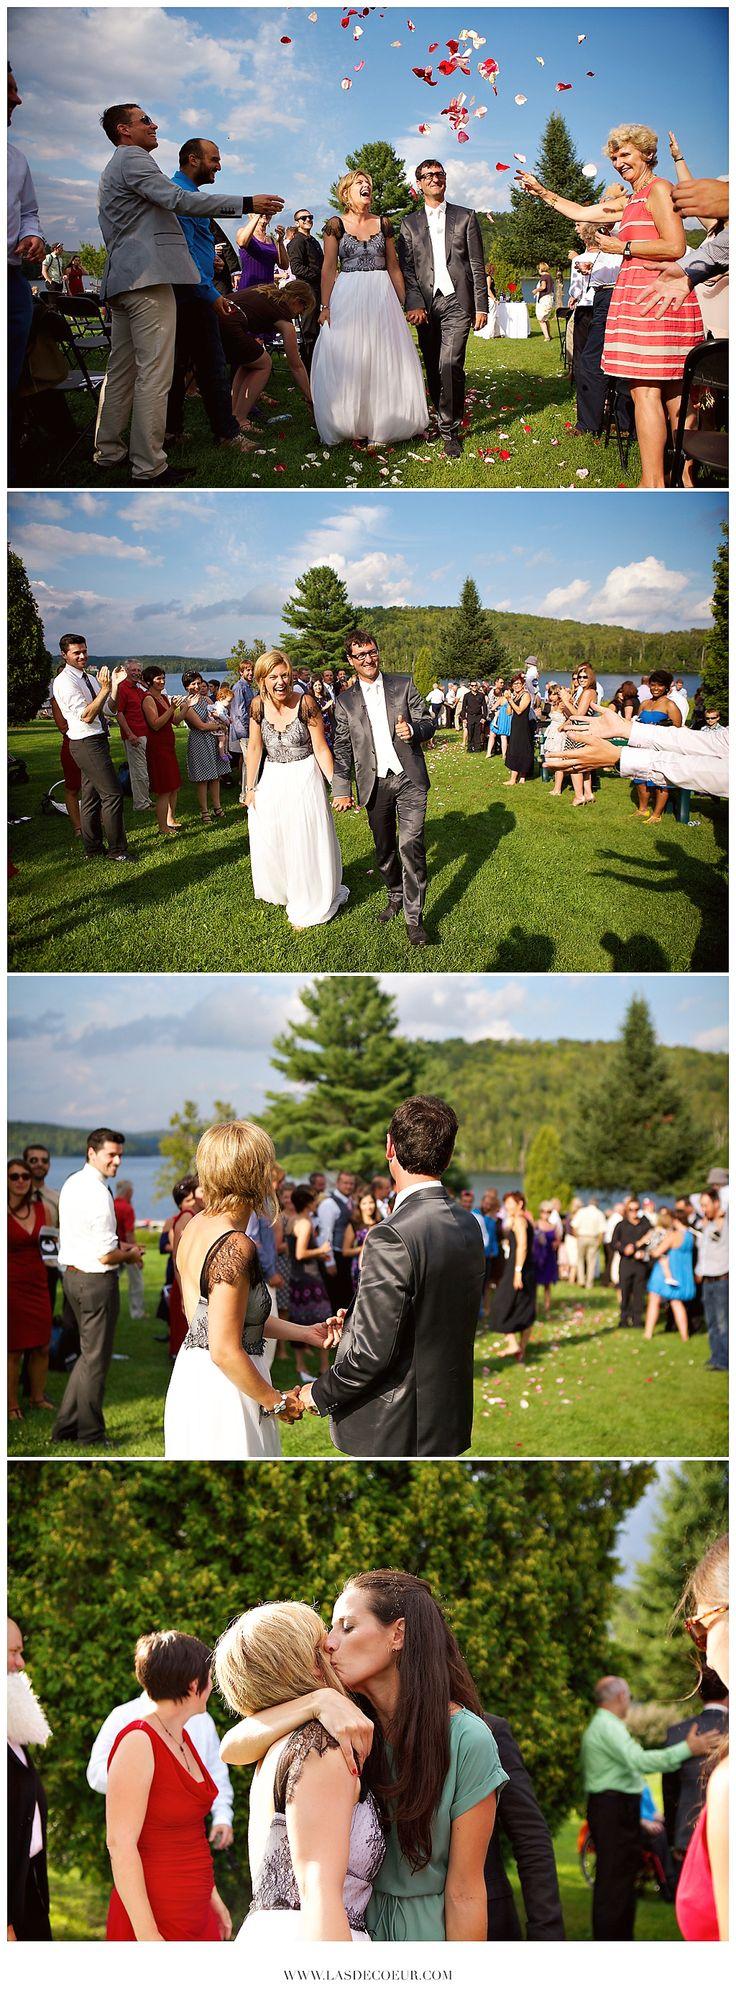 Mariage au Canada, ceremonie laïque©lasdecoeur9